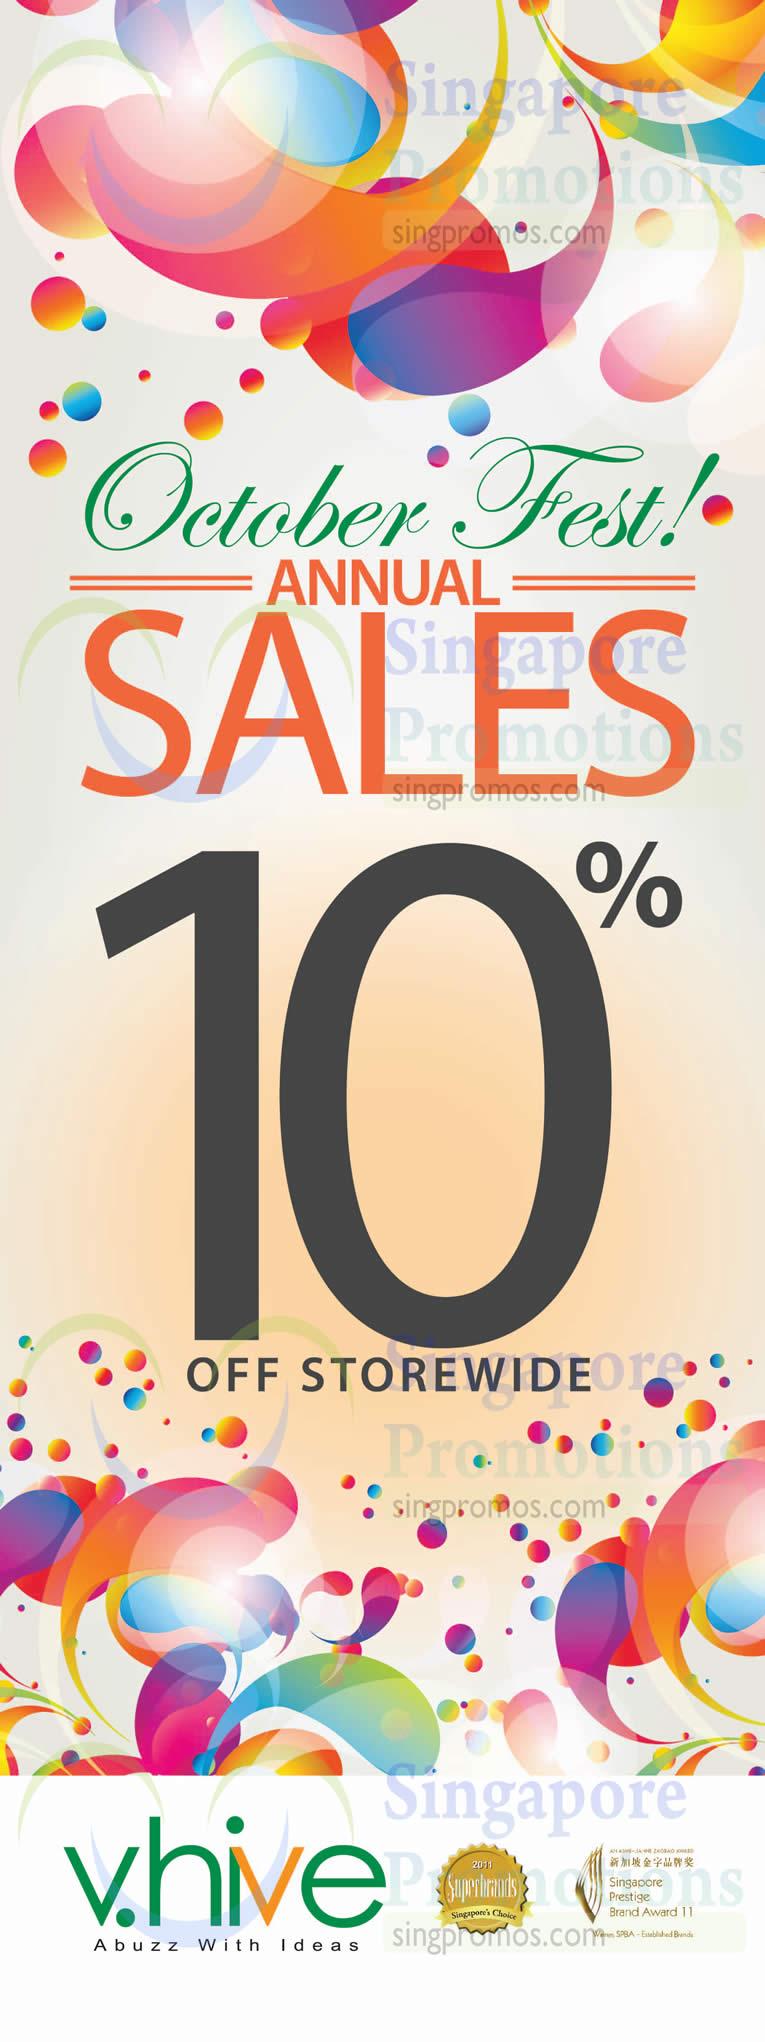 October Fest 10 Percent Off Storewide